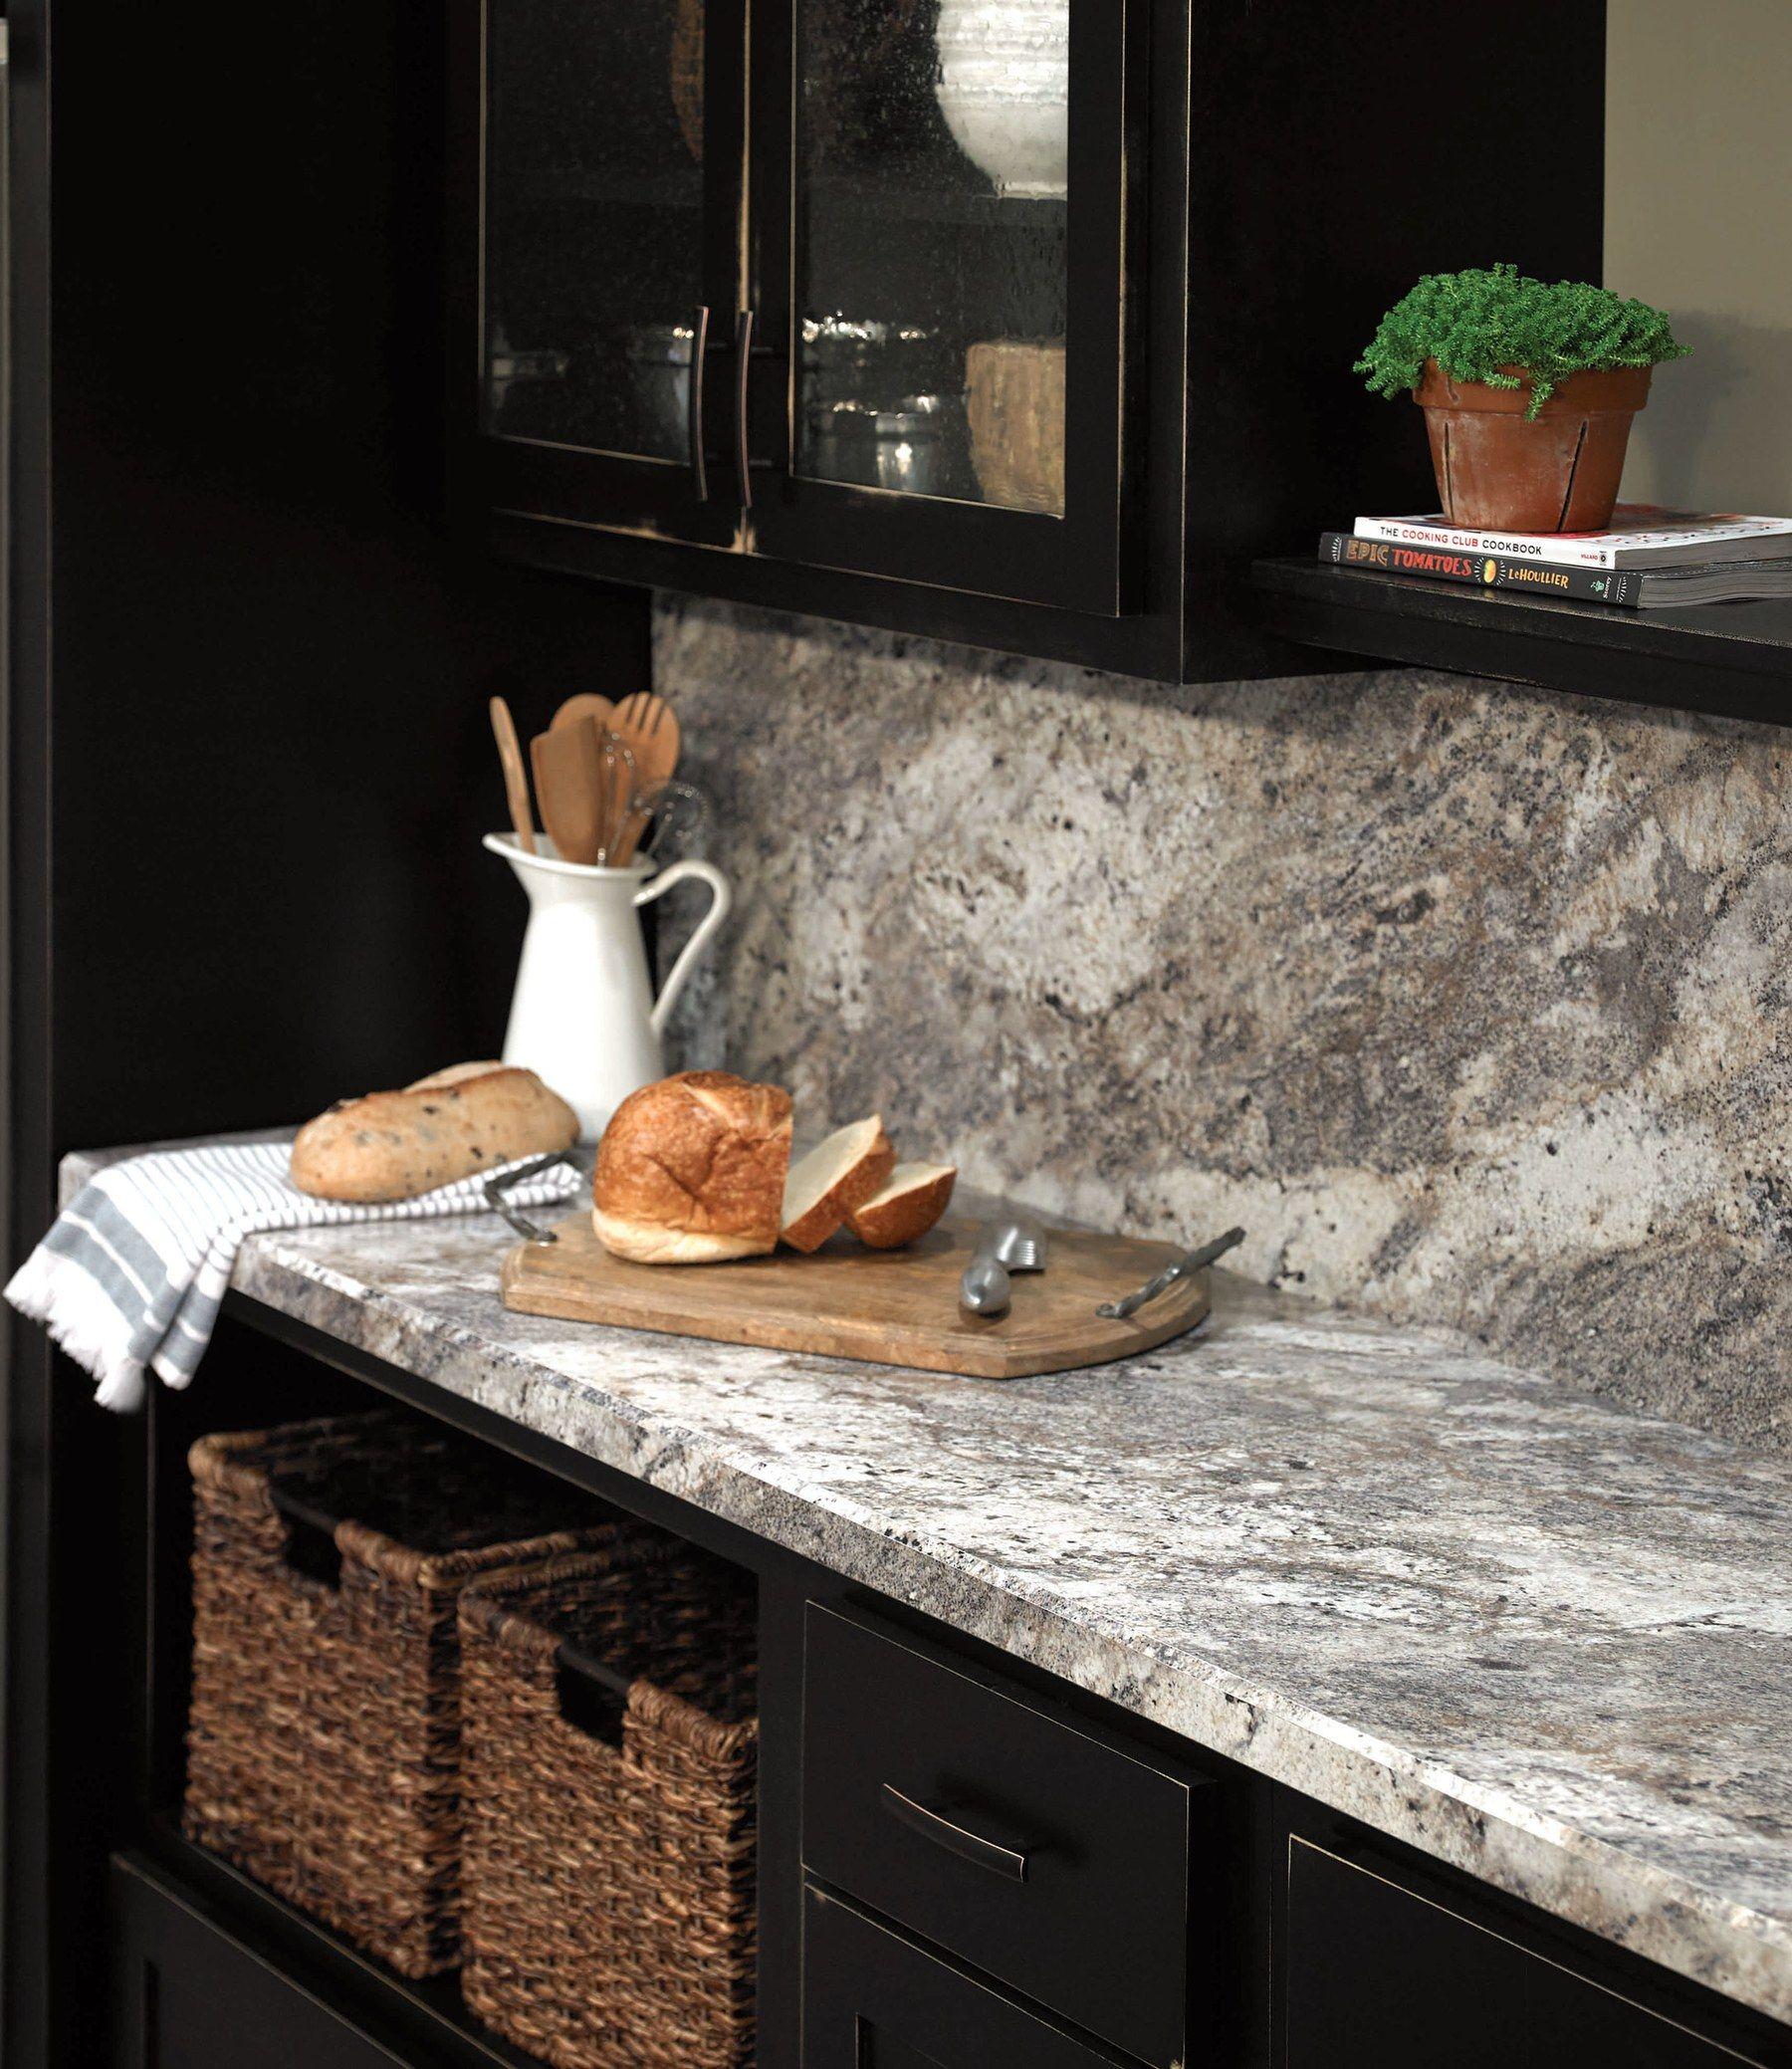 Big News: The Most Popular Countertop Isnu0027t Marble!